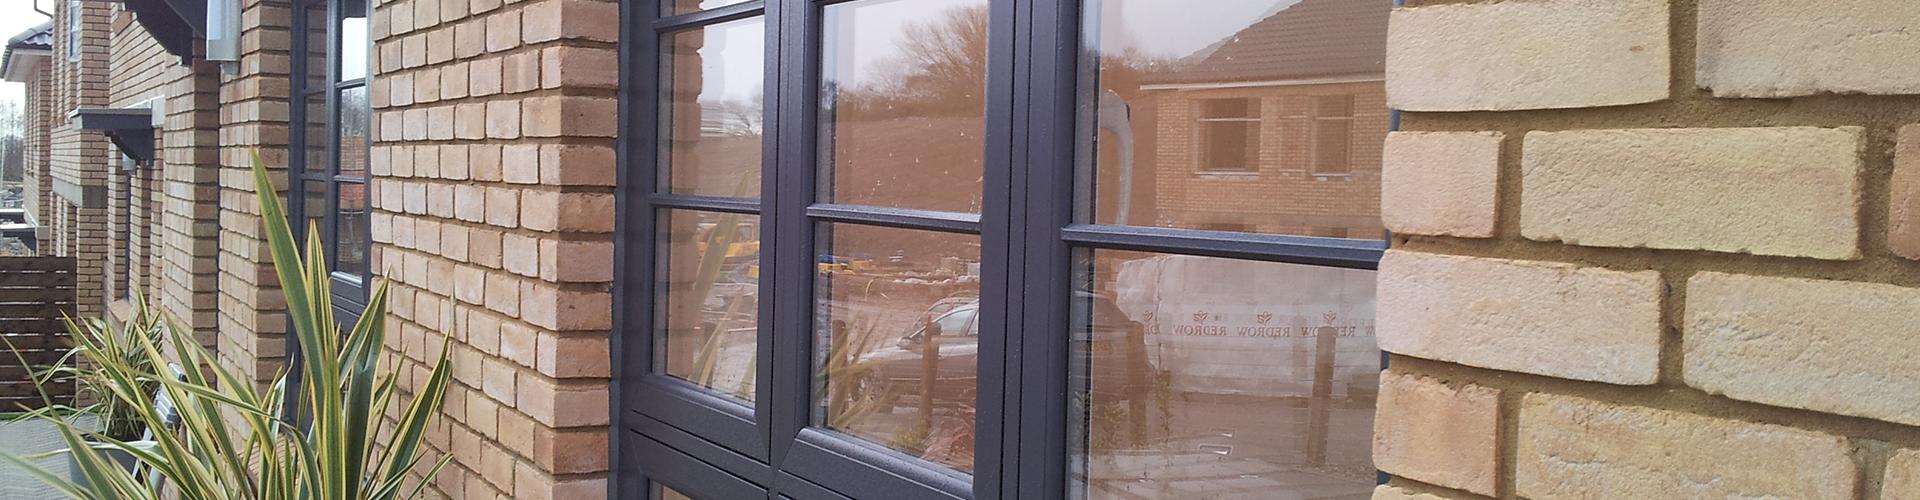 Barton S Windows Doors Amp Conservatories Leaderquote